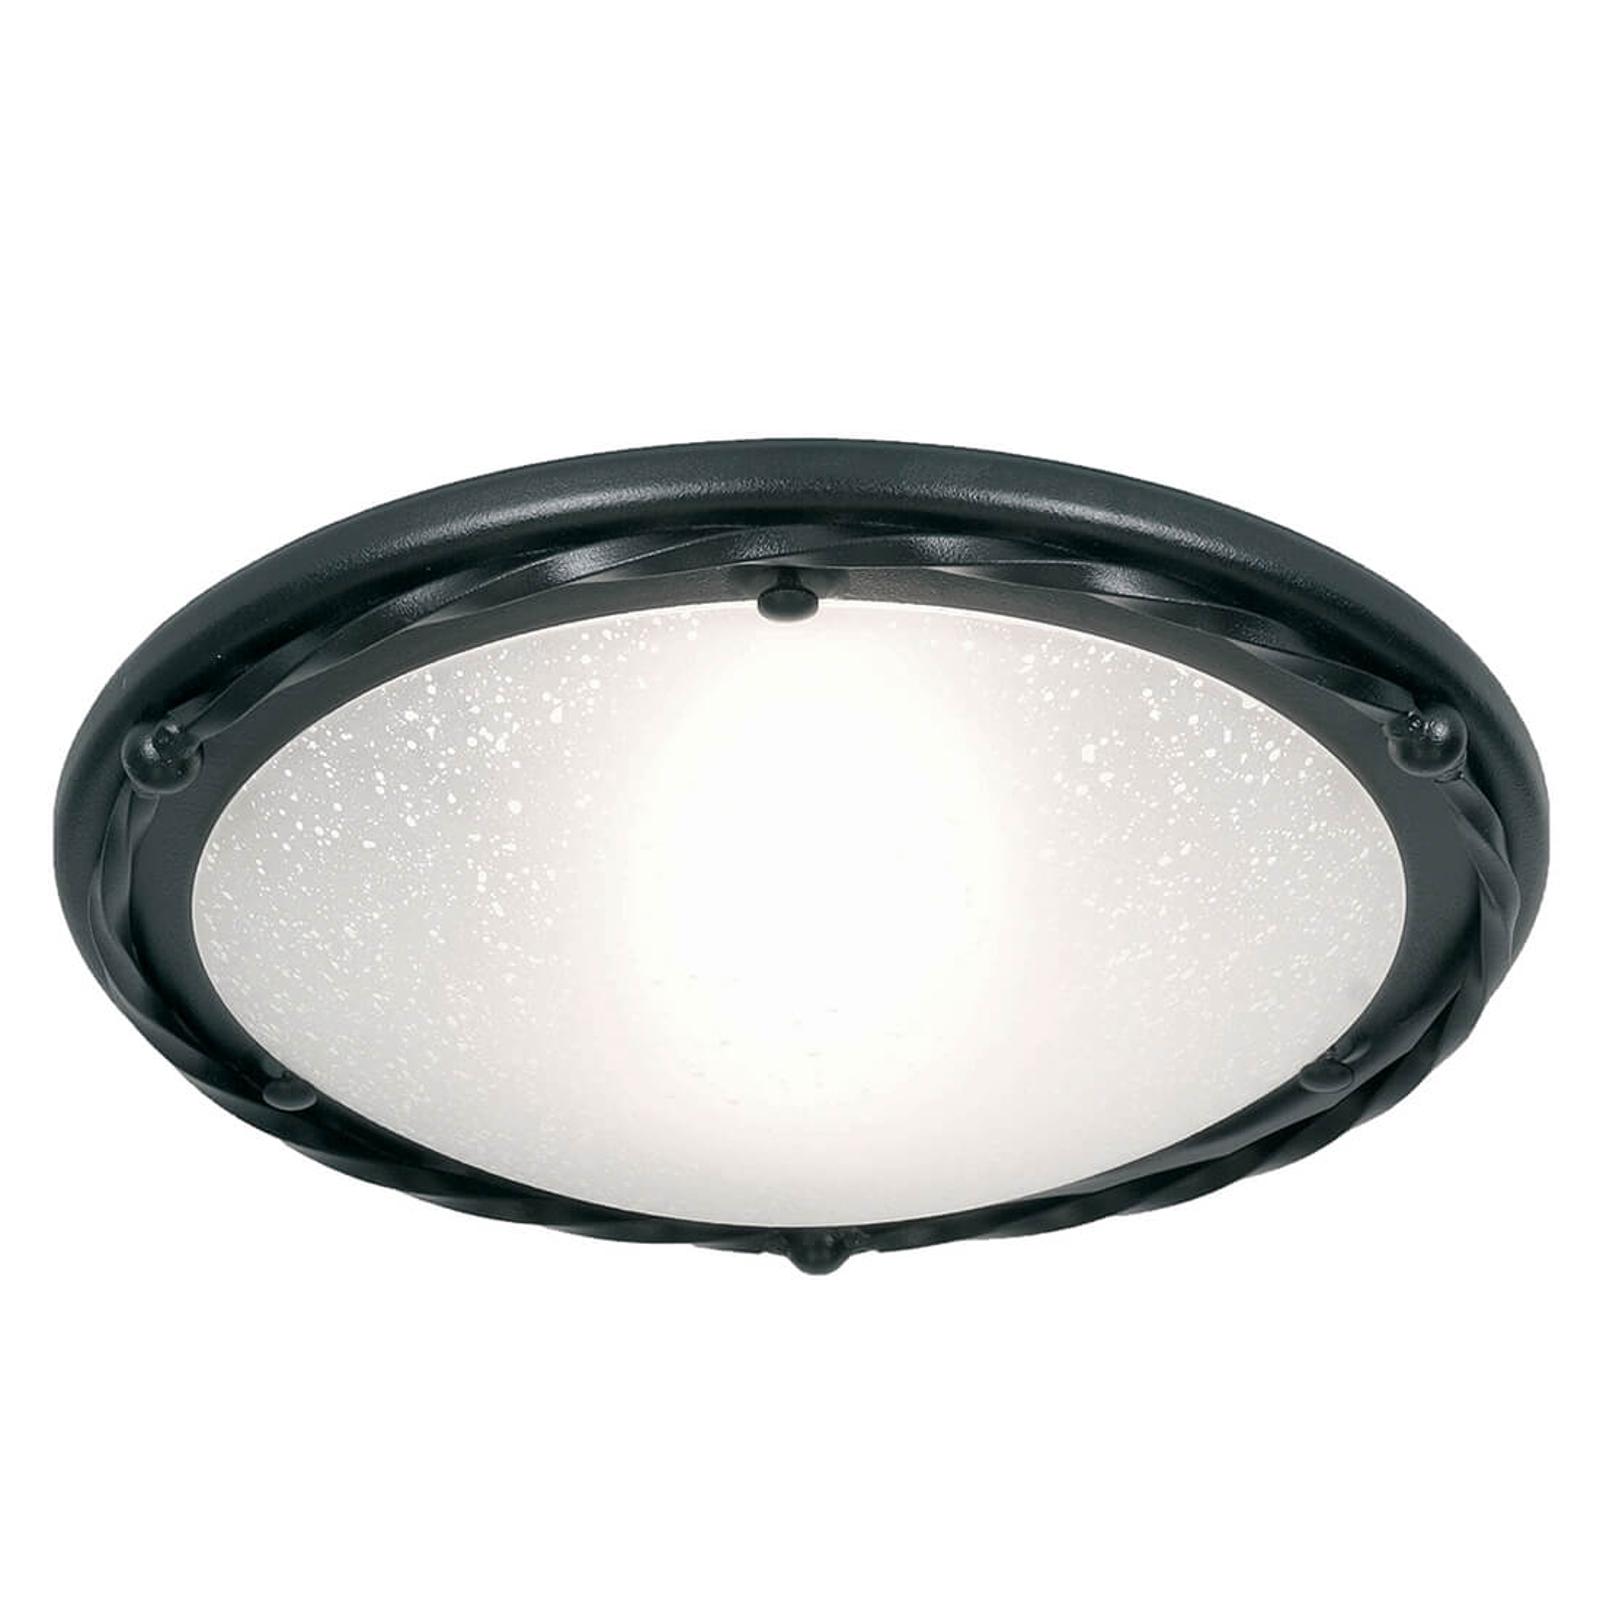 Plafondlamp Pembroke, vlak, frame zwart